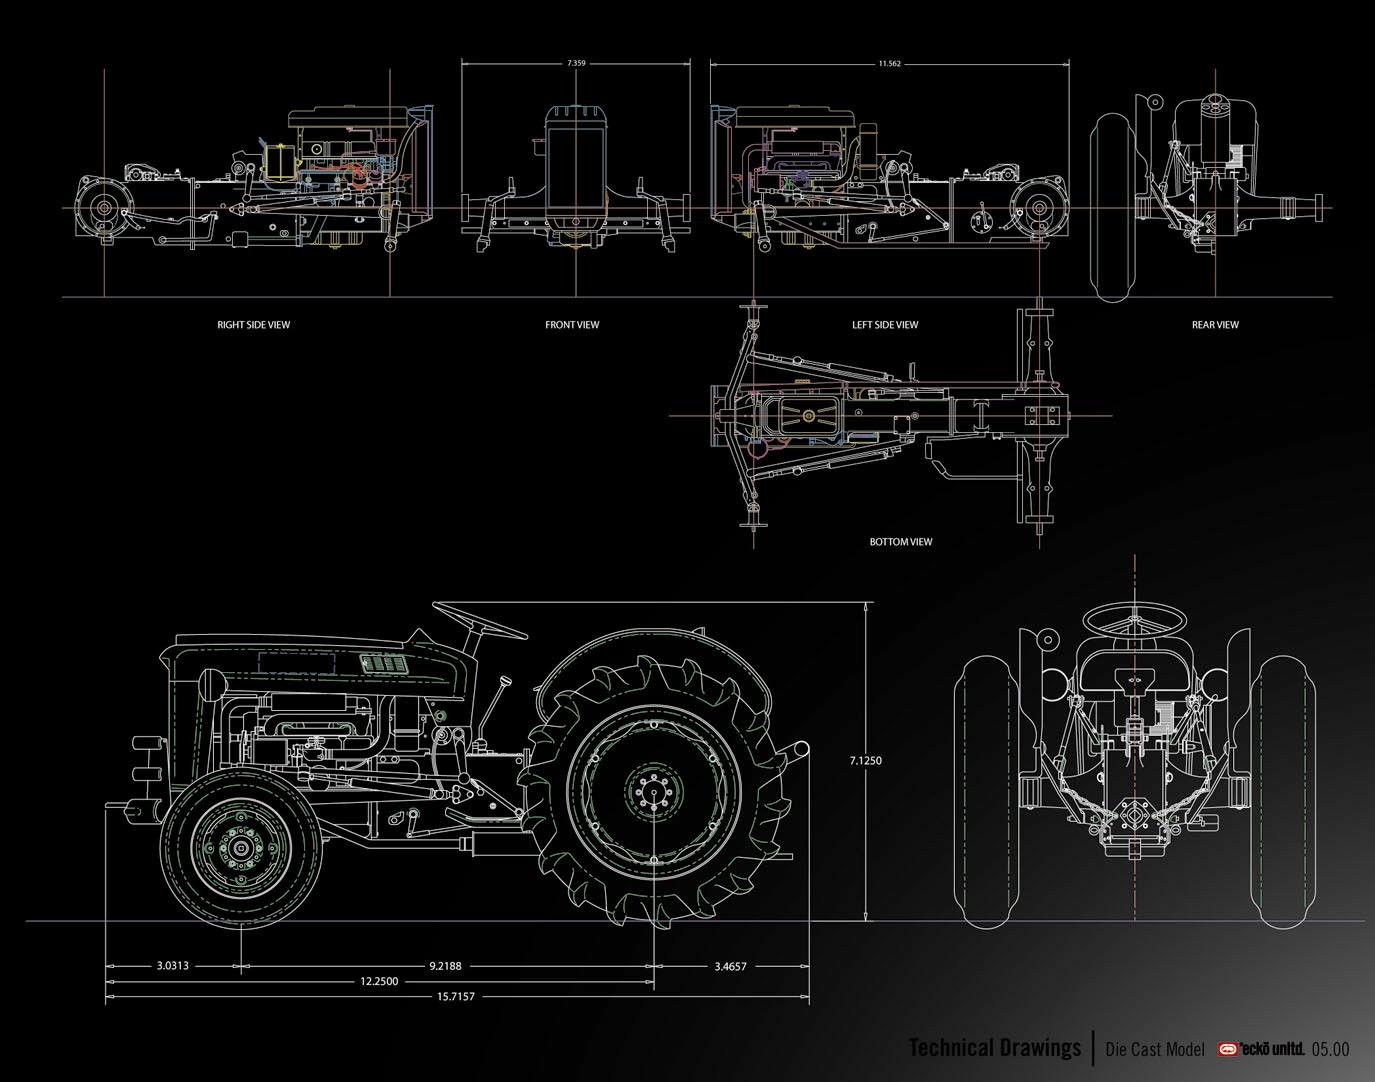 Technical by James Farran at Coroflot.com